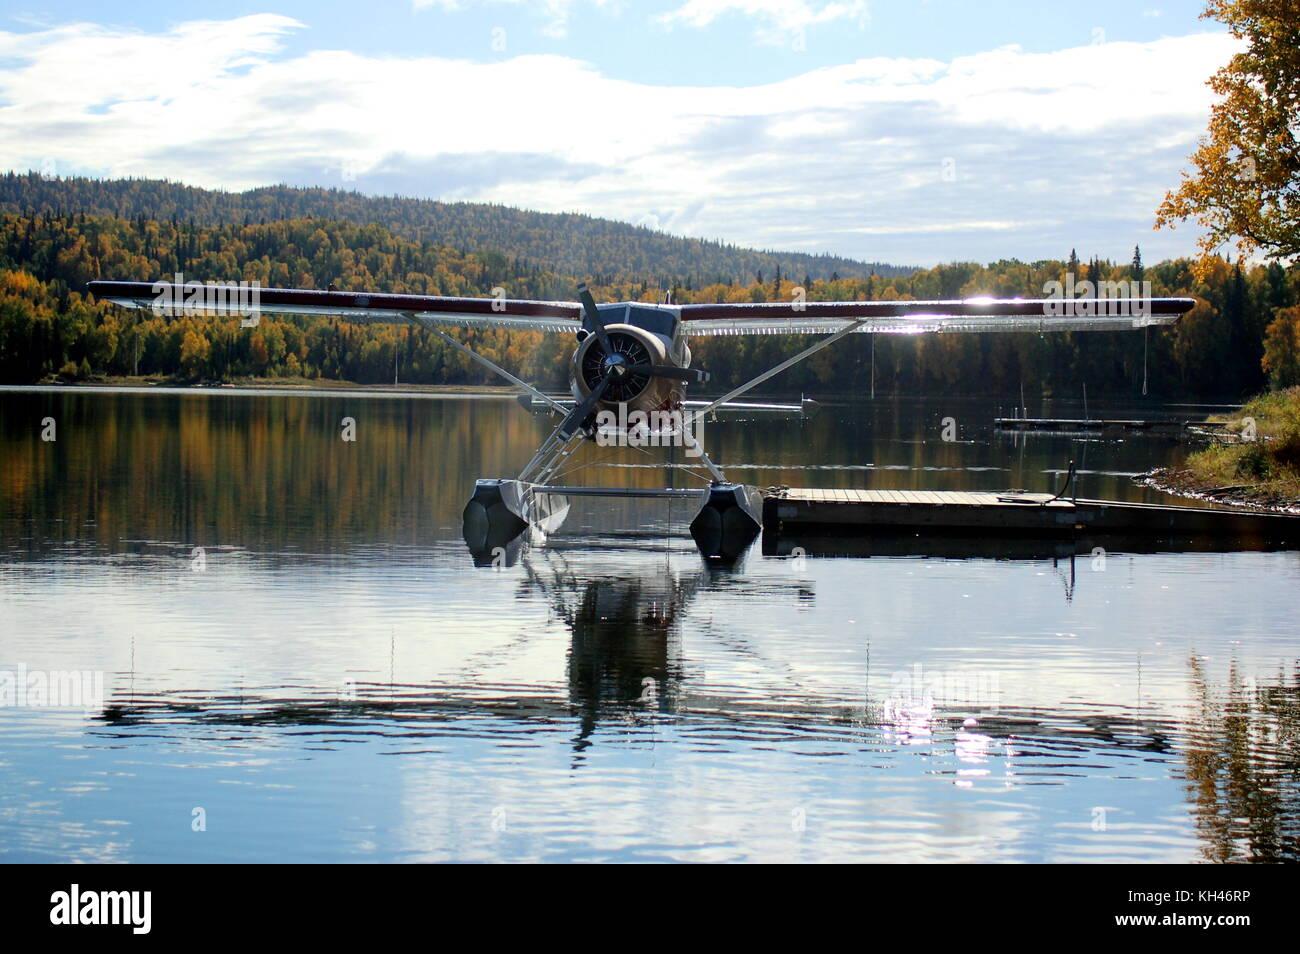 The ubiquitous yet quintessential Alaska bush plane, a DeHavilland DHC-2 'Beaver' - Stock Image